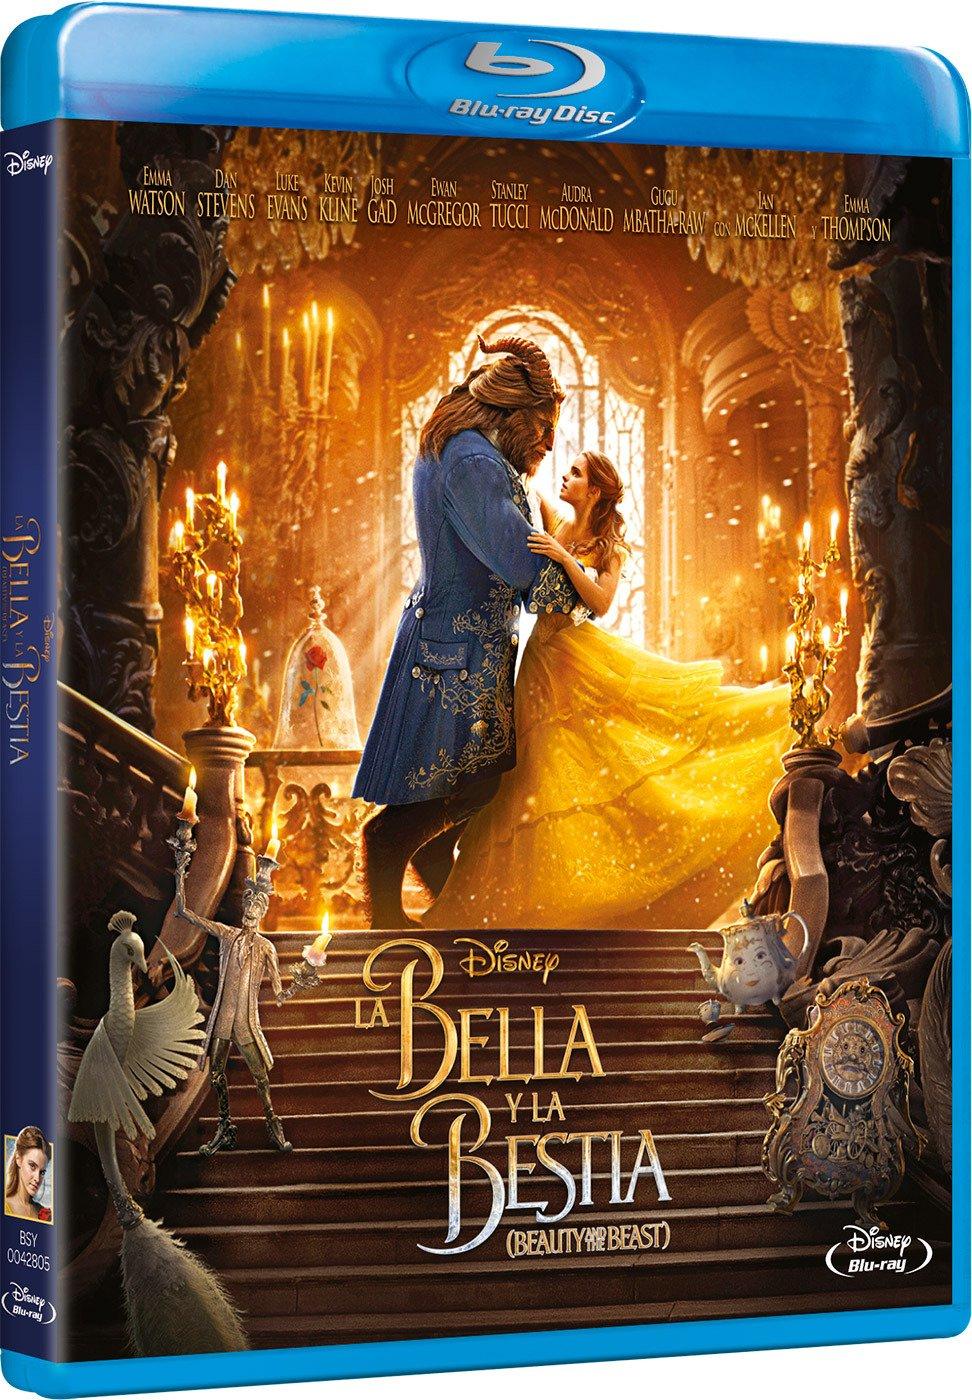 La Bella y La Bestia [Blu-ray]: Amazon.es: Emma Watson, Dan Stevens, Luke Evans, Bill Condon, Emma Watson, Dan Stevens: Cine y Series TV